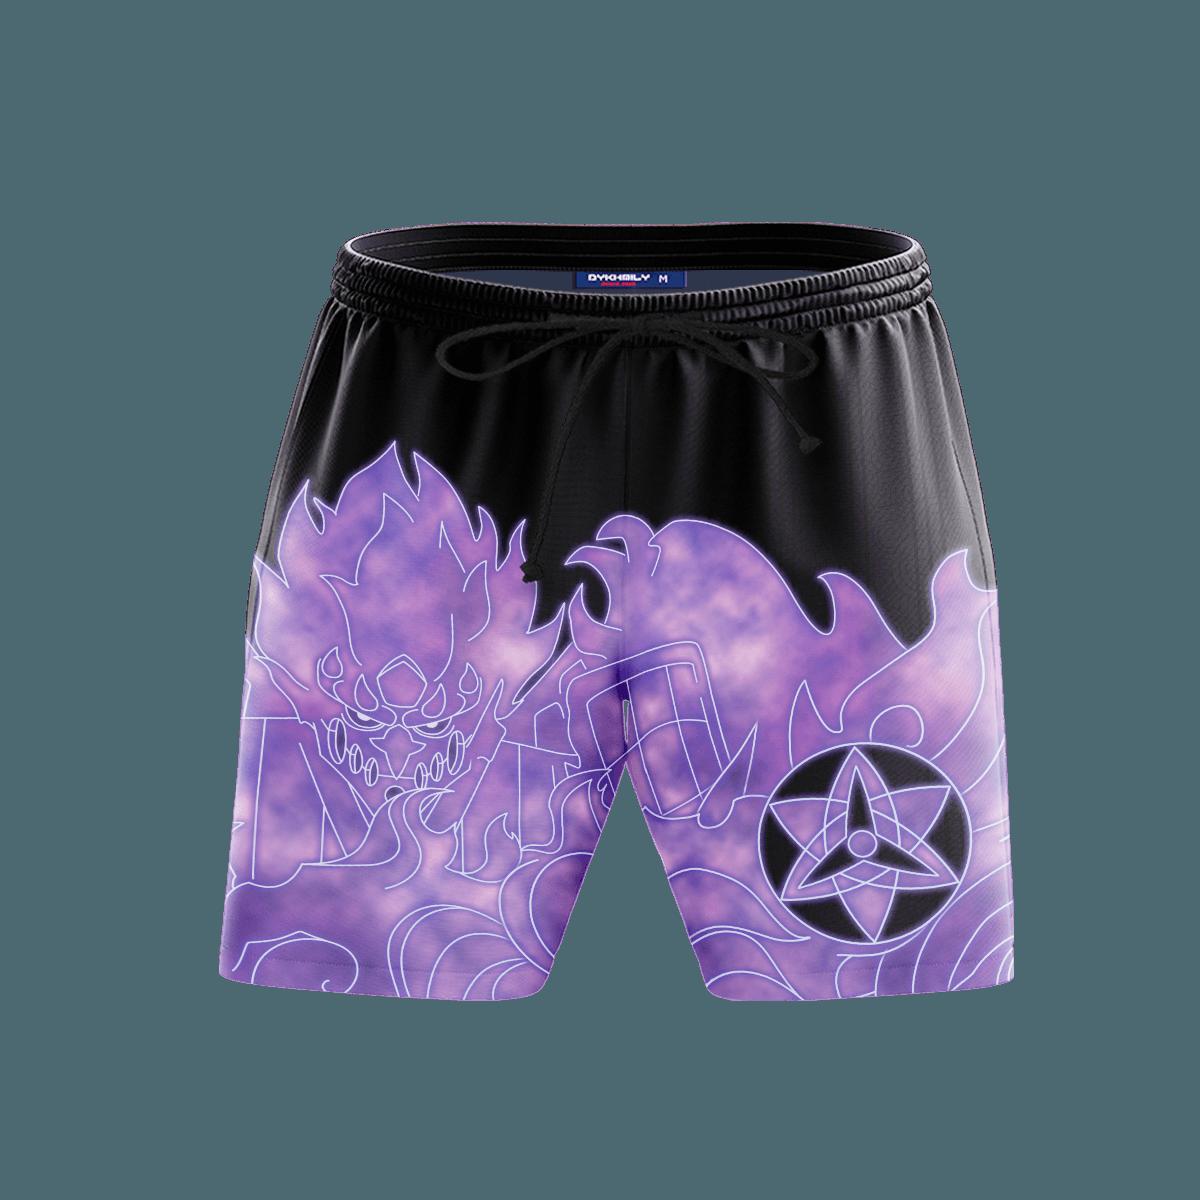 Sasuke Armor Beach Shorts FDM3107 S Official Anime Swimsuit Merch